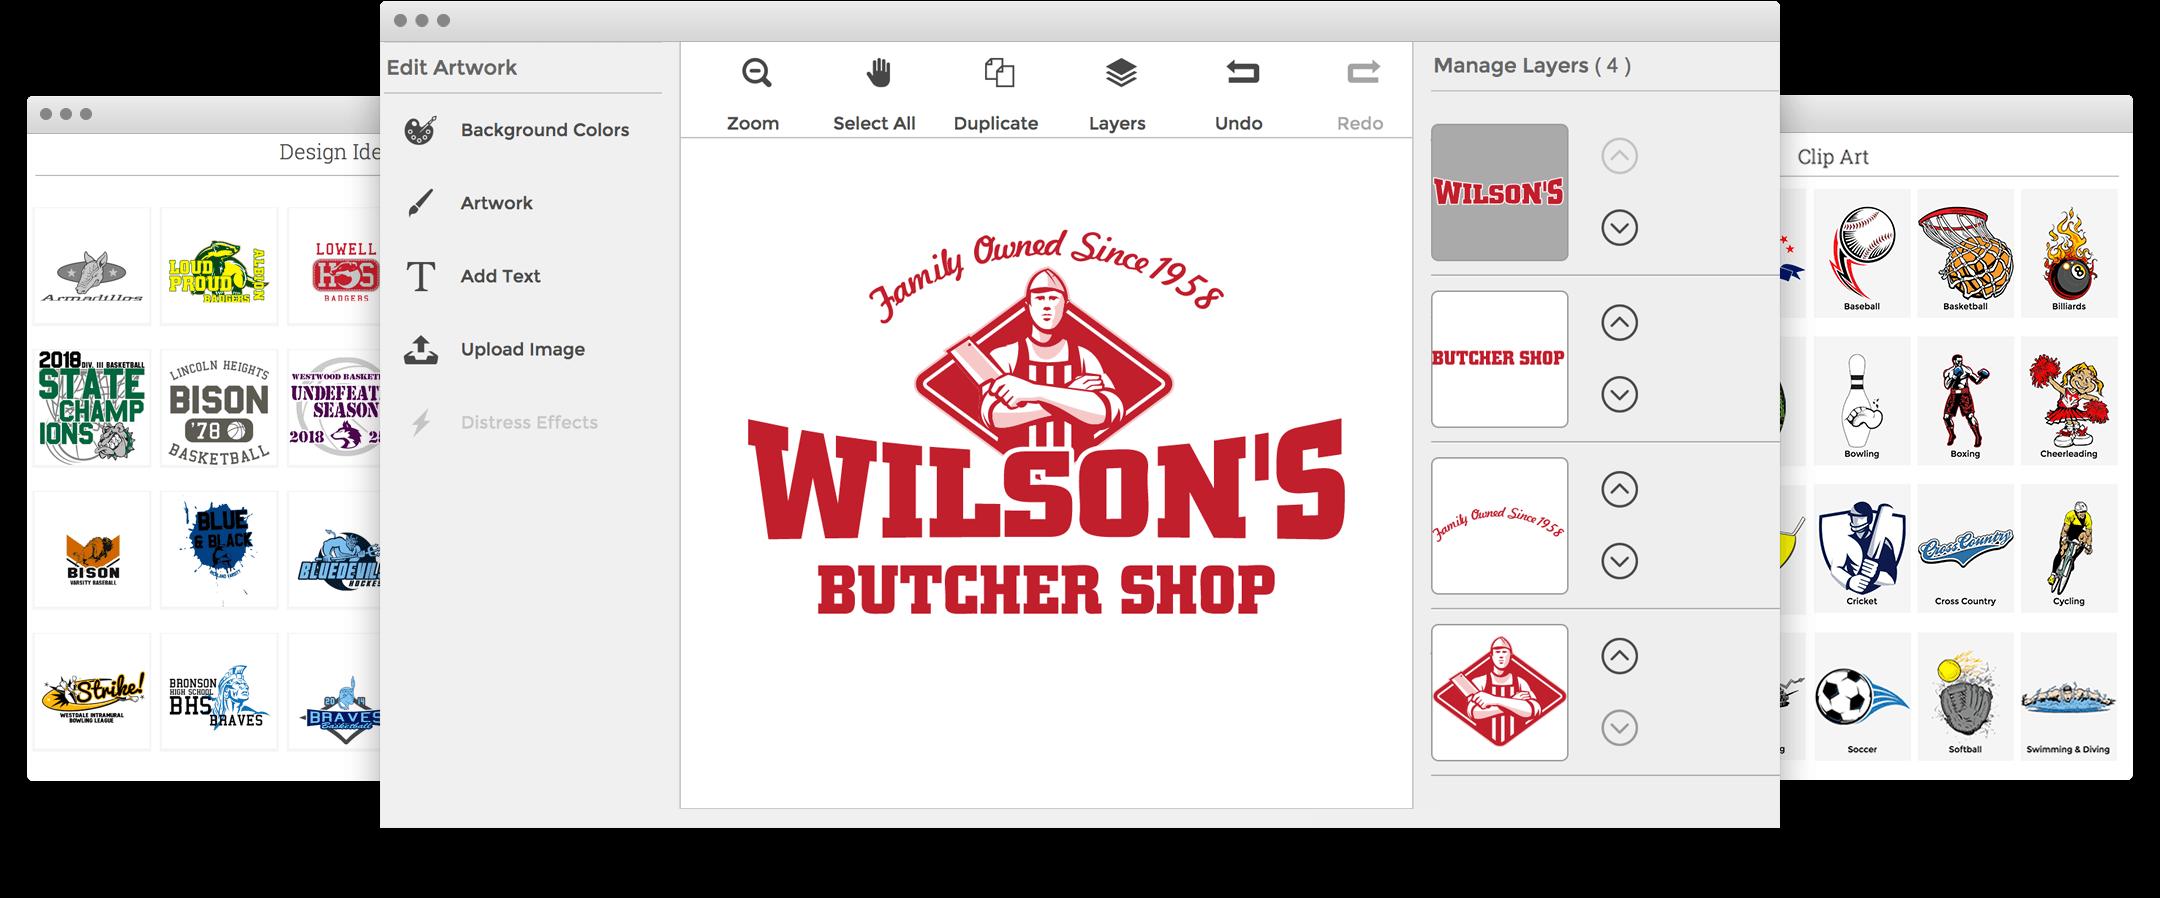 How to Create Stunning Designs Using an Online Design Studio